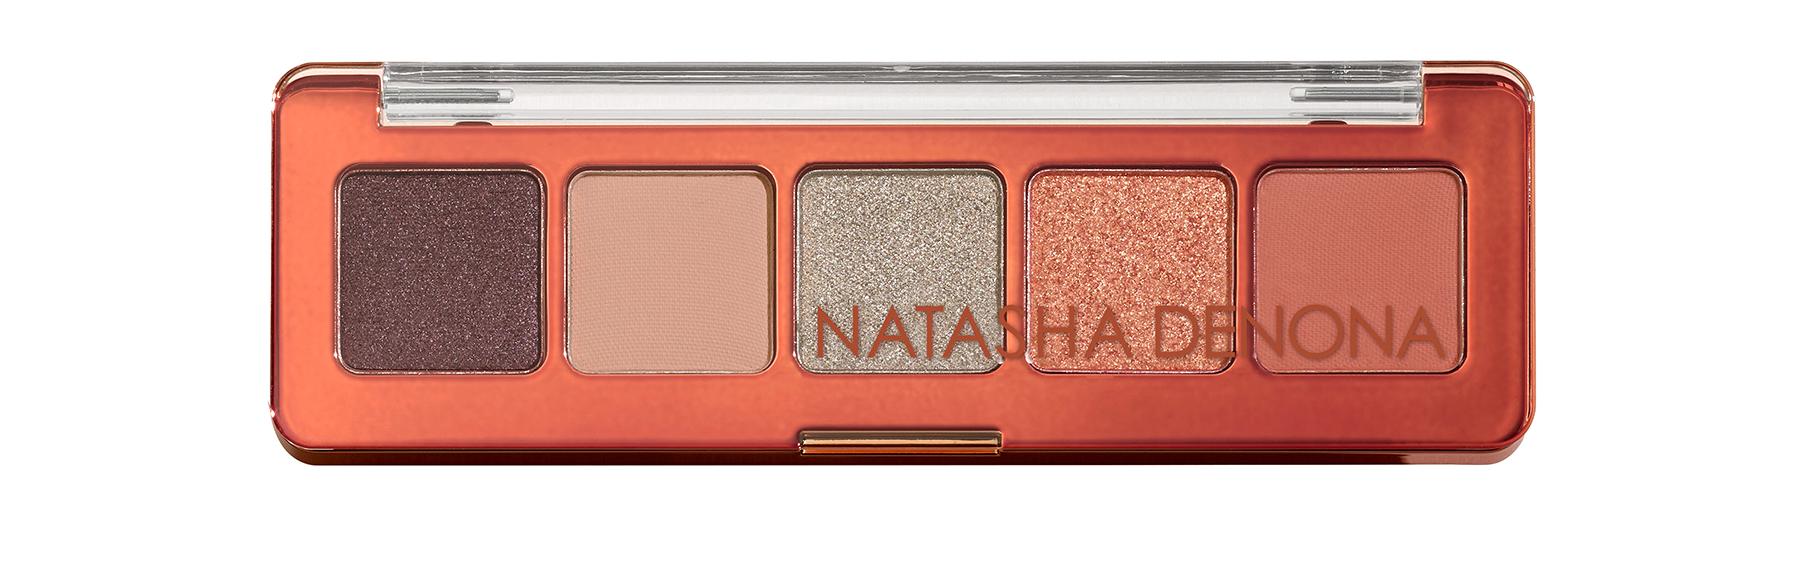 Natasha Denona, la collezione make-up Natale 2020